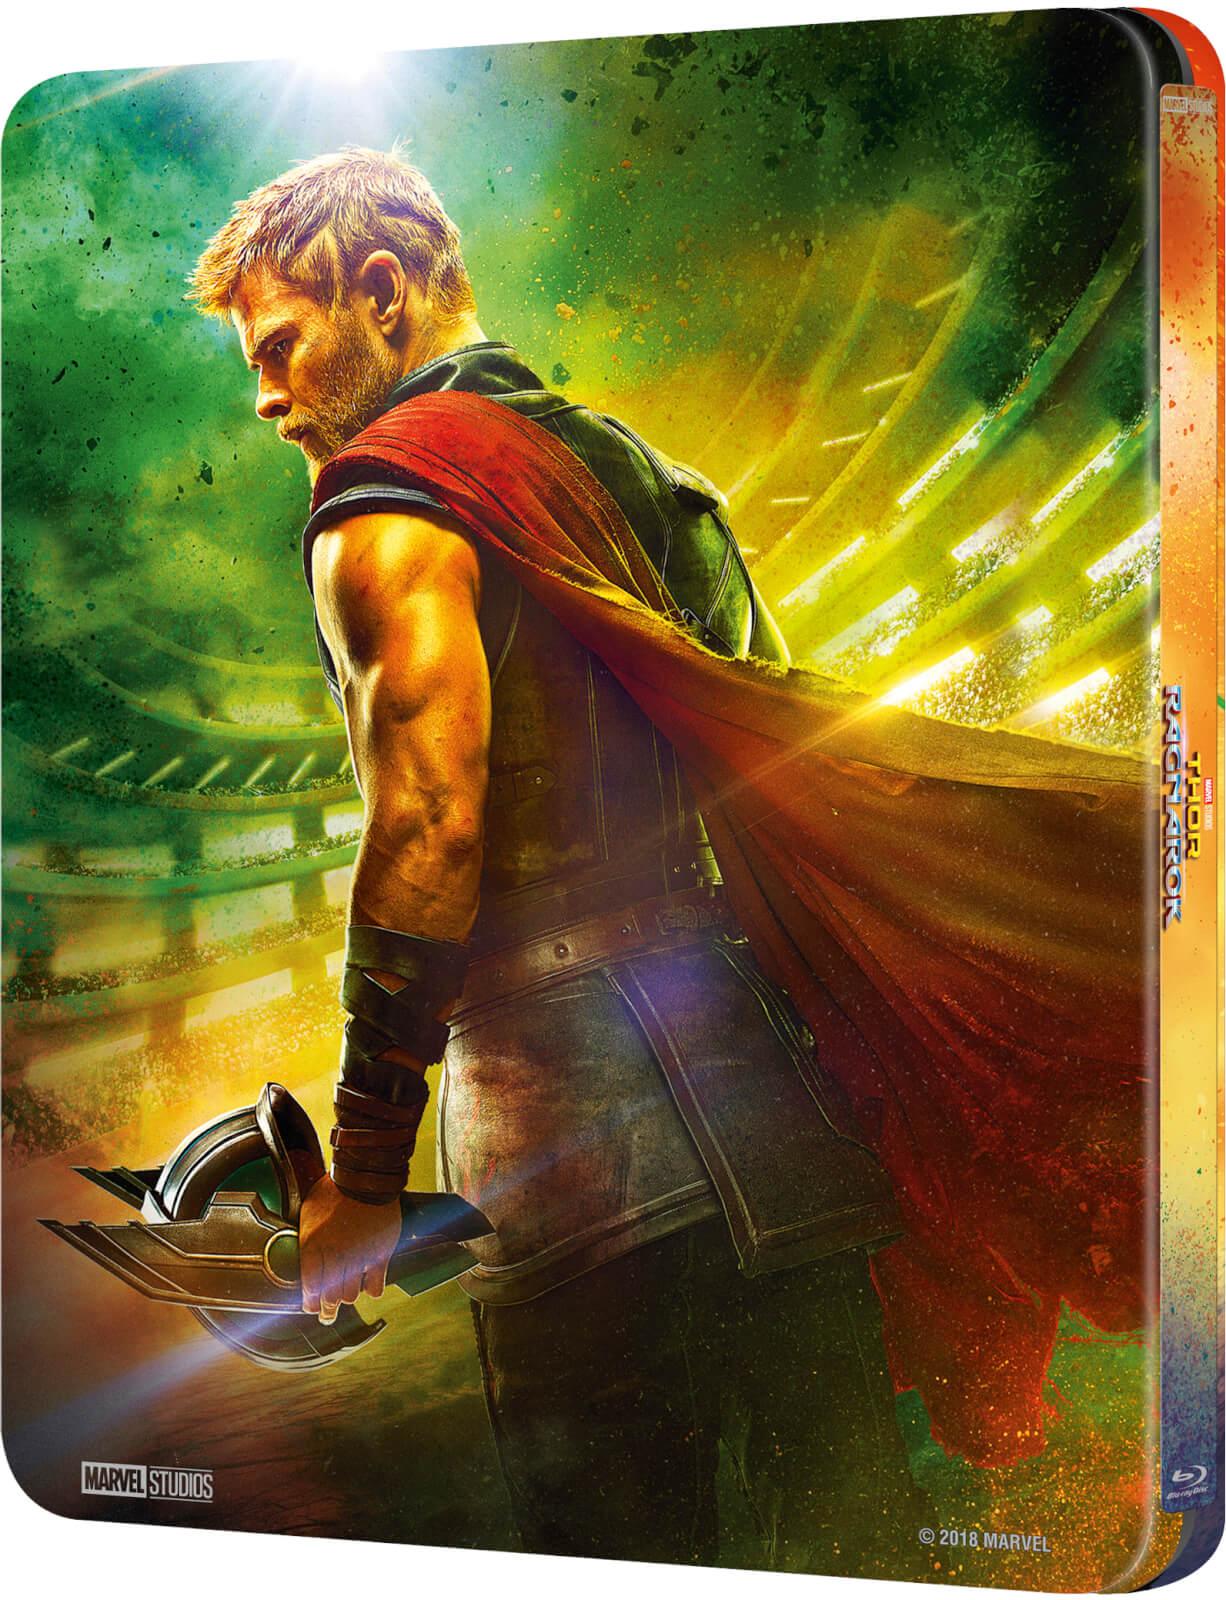 Thor: Ragnarok SteelBook back